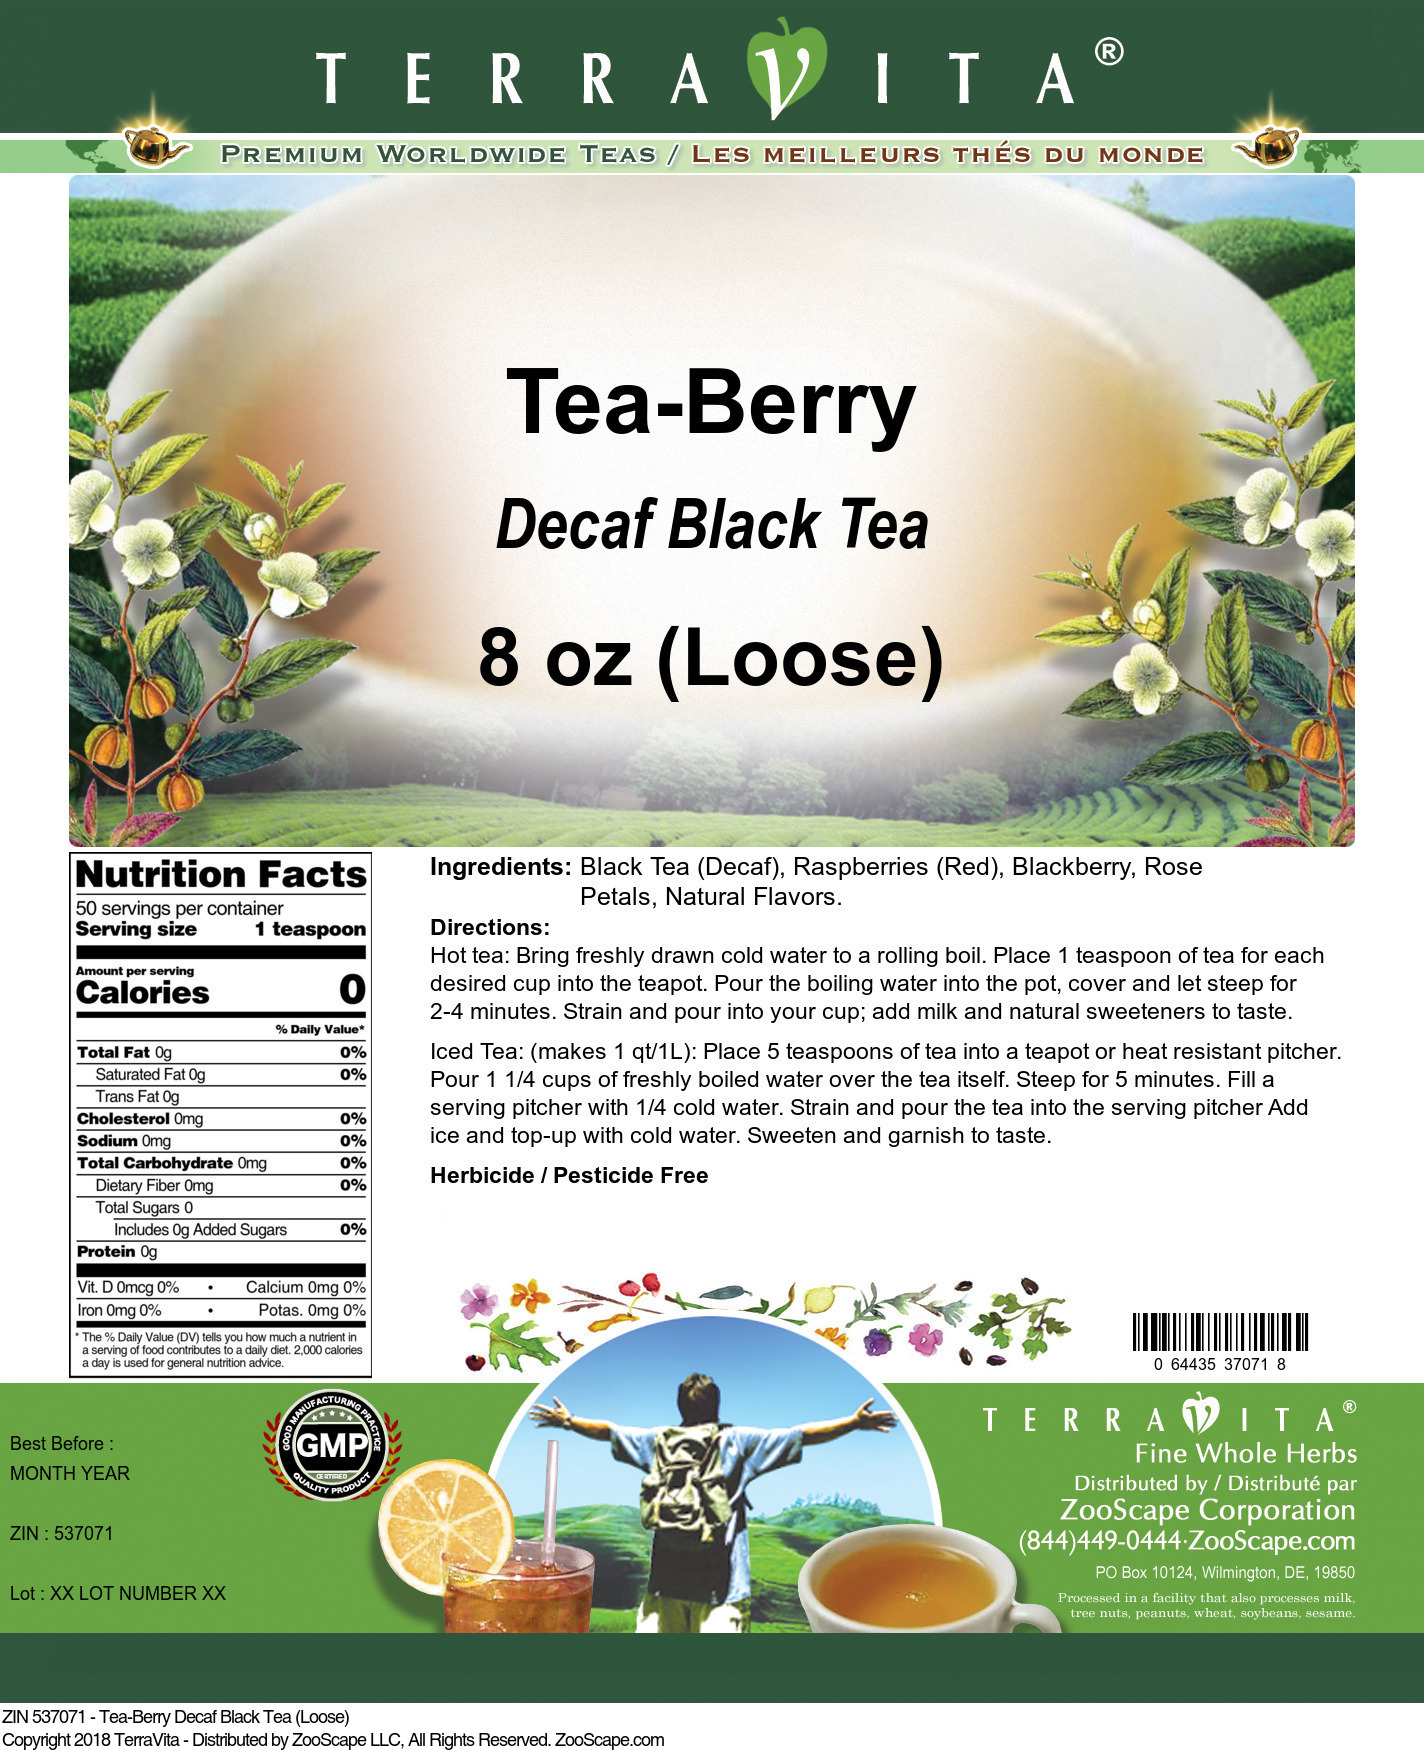 Tea-Berry Decaf Black Tea